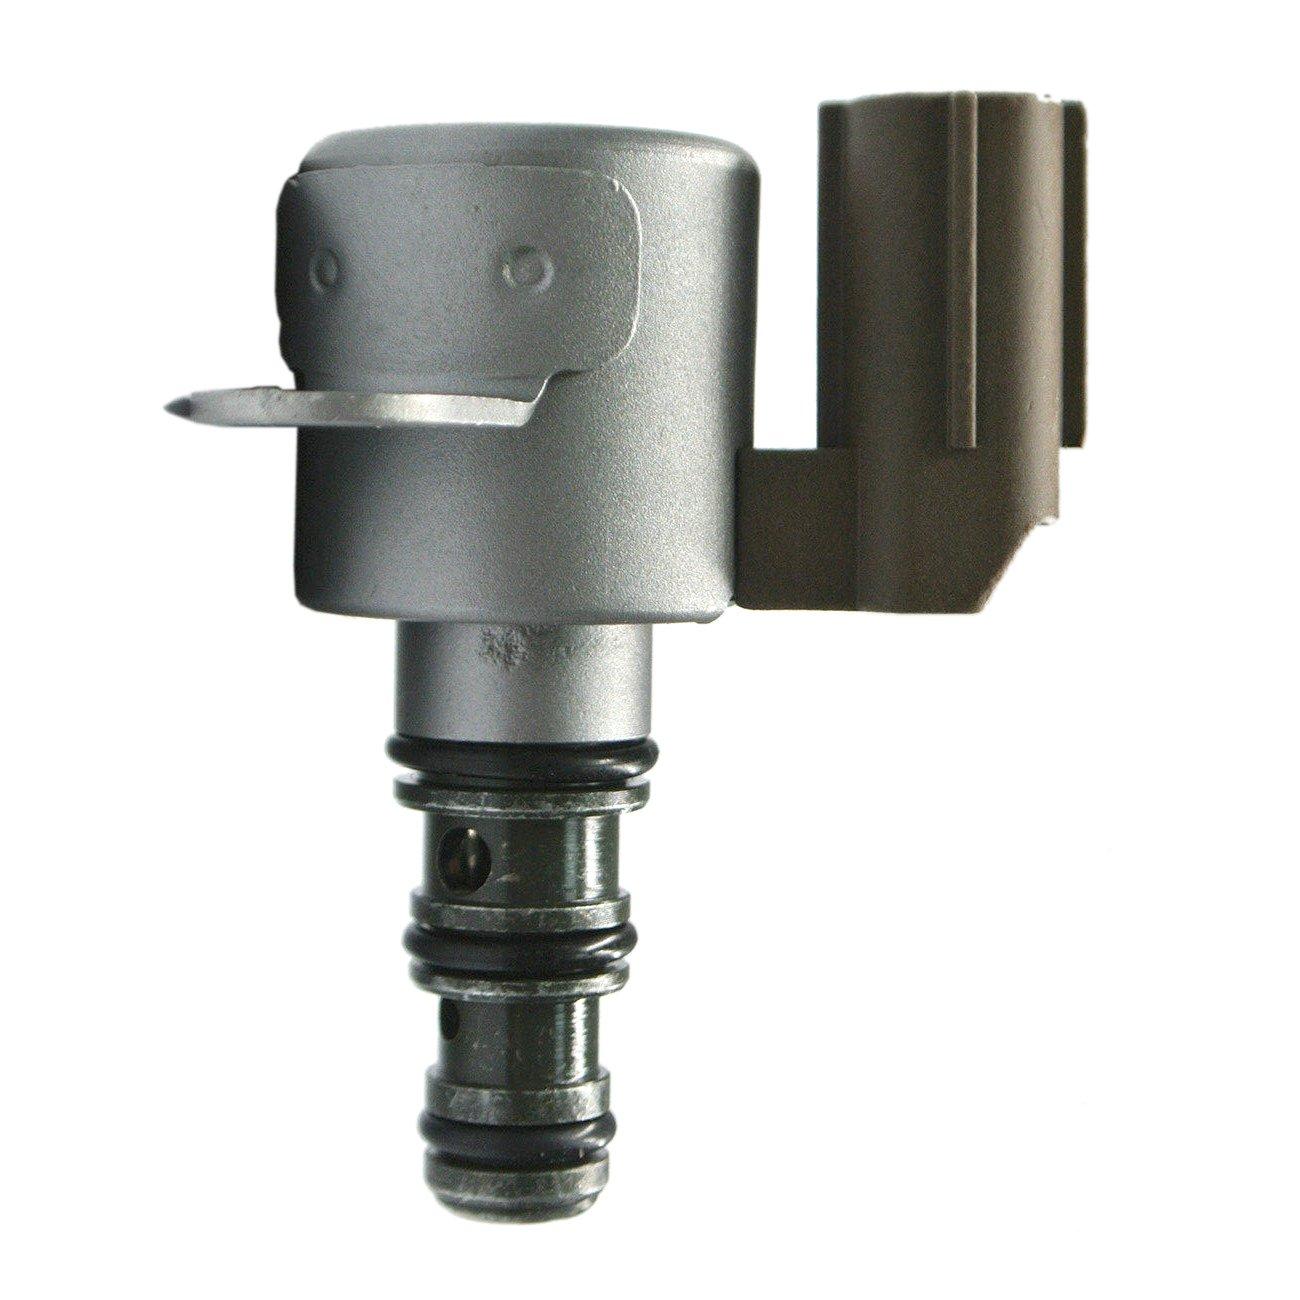 JRL Transmission Shift Control Solenoid For Honda Accord Odyssey 28500-P6H-003